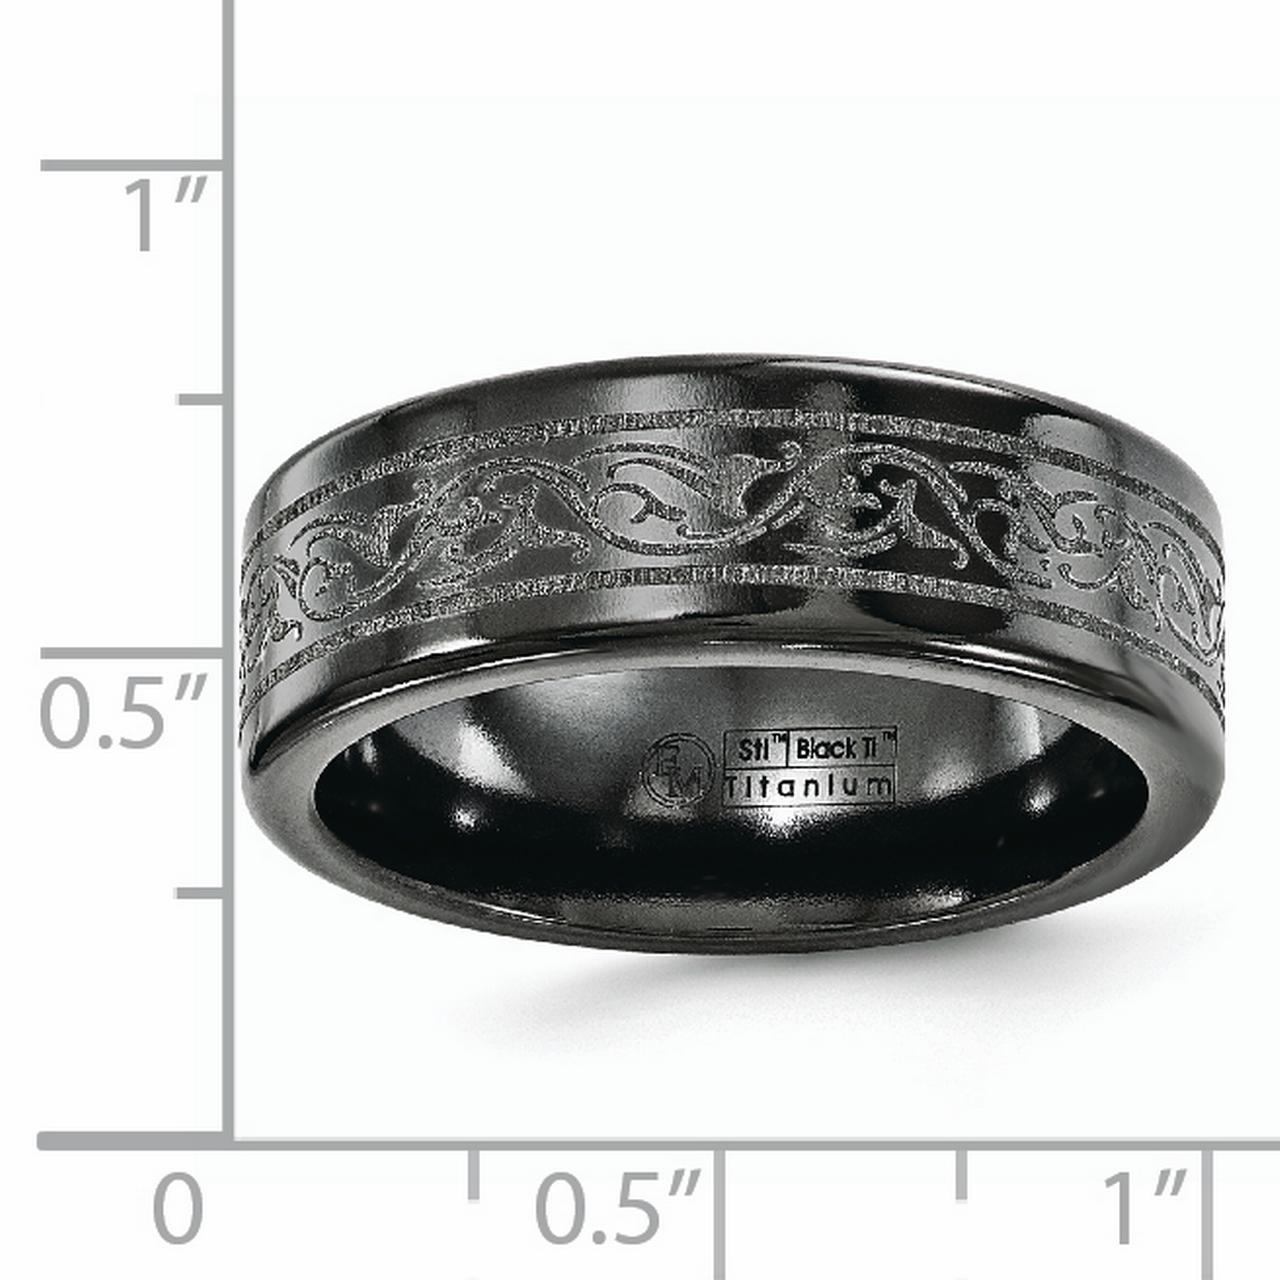 Bridal Wedding Bands Decorative Bands Edward Mirell Black Ti Grey Grooves 6mm Band Size 7